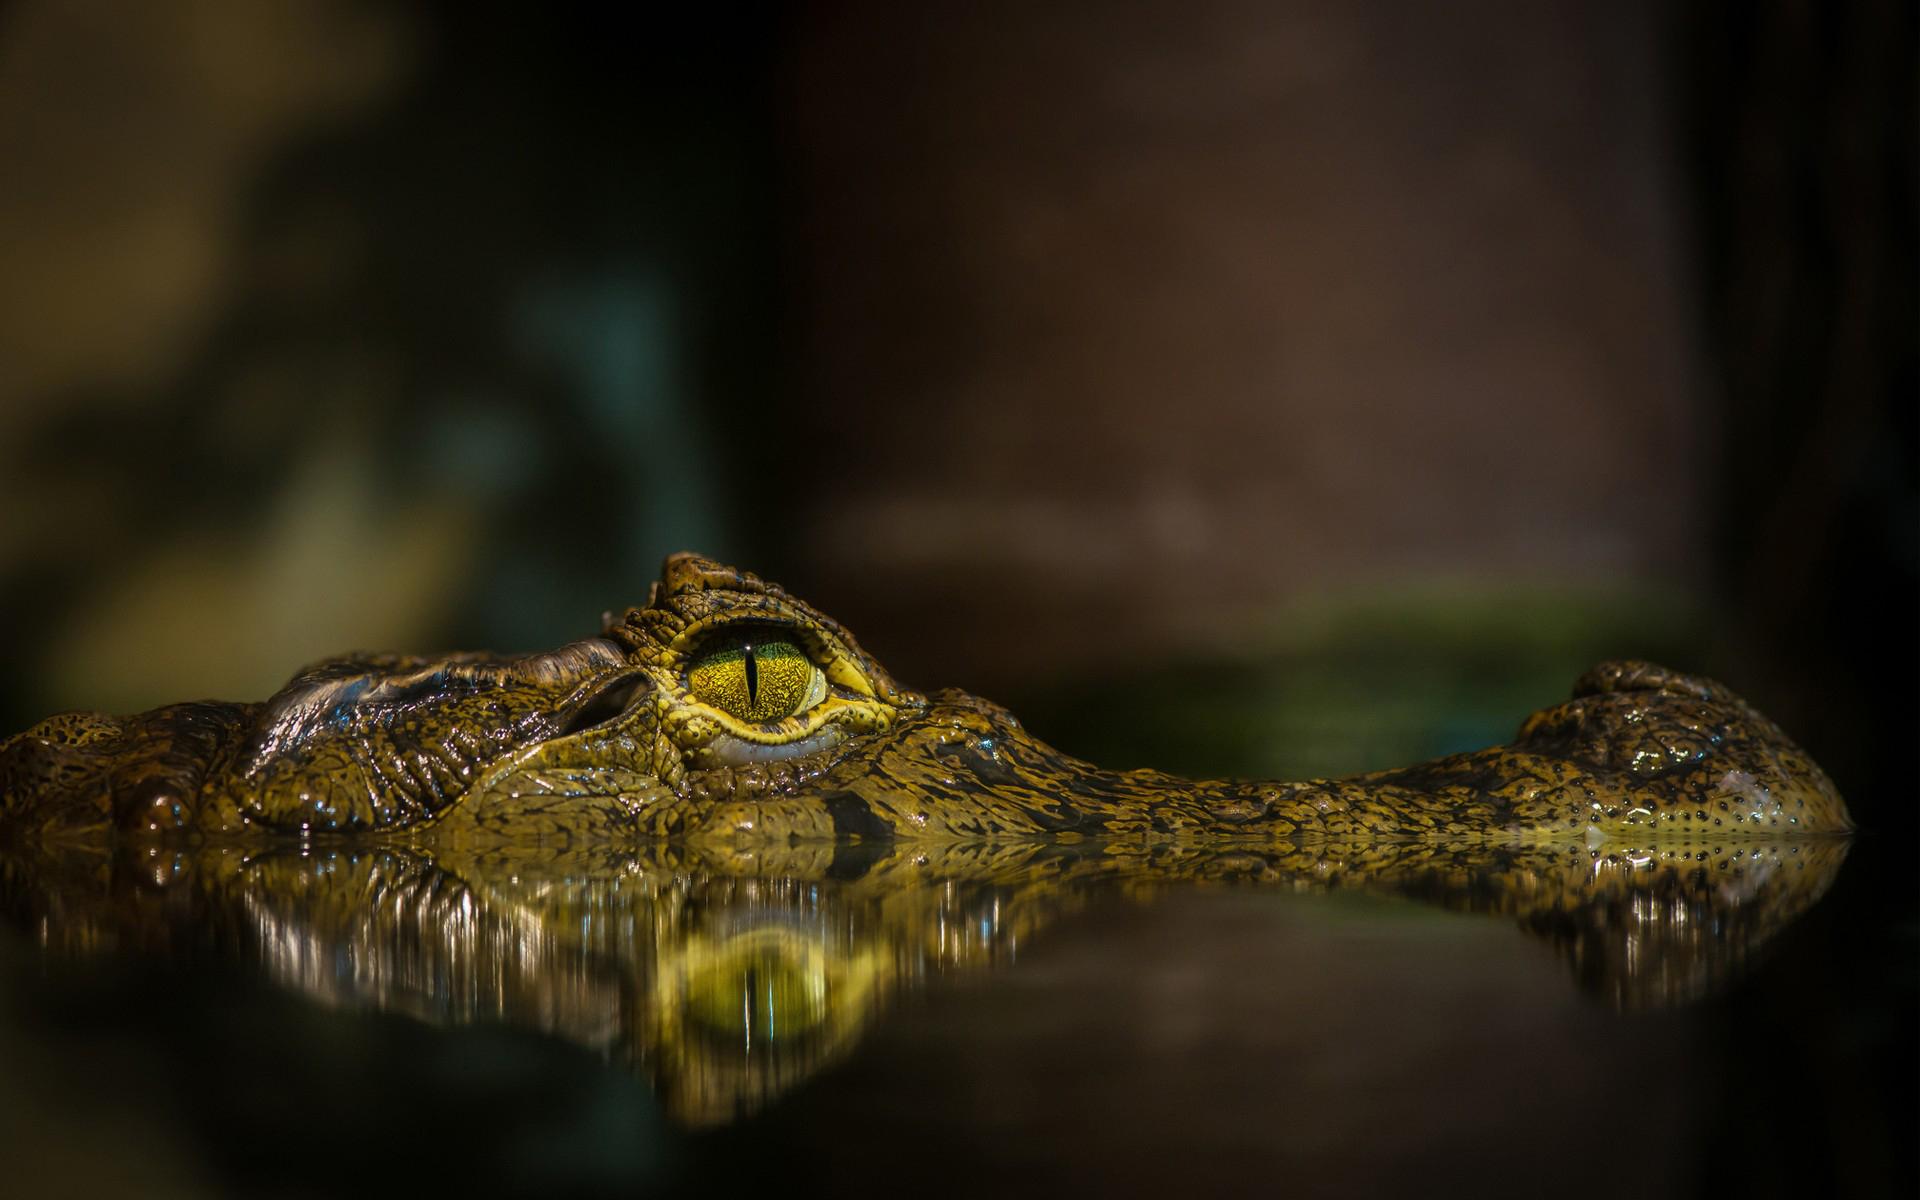 Crocodile HD Wallpaper | Background Image | 1920x1200 | ID ...